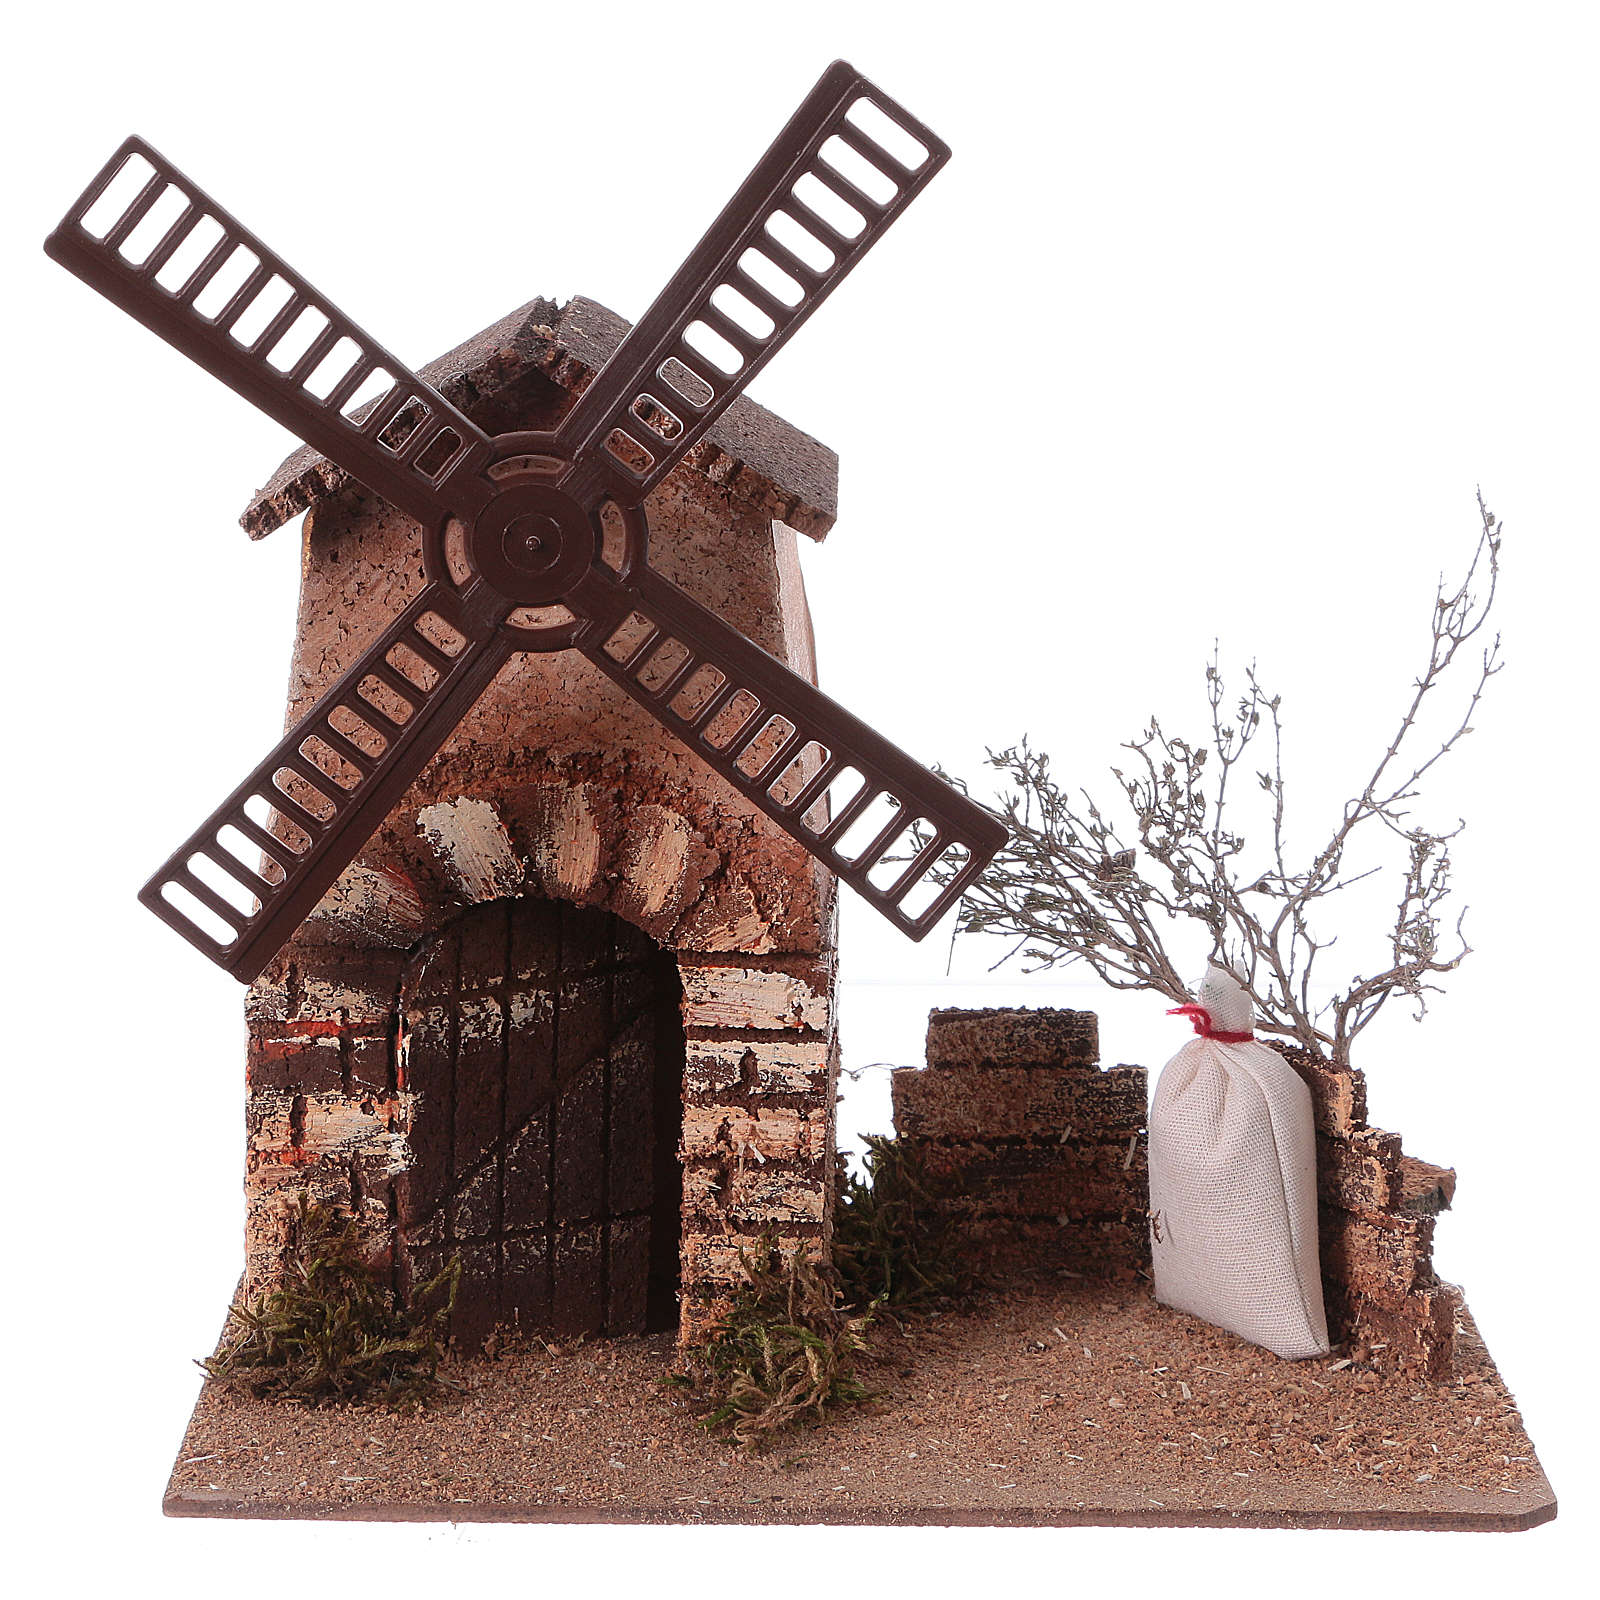 Nativity scene windmill in cork 20x15x25 cm 4